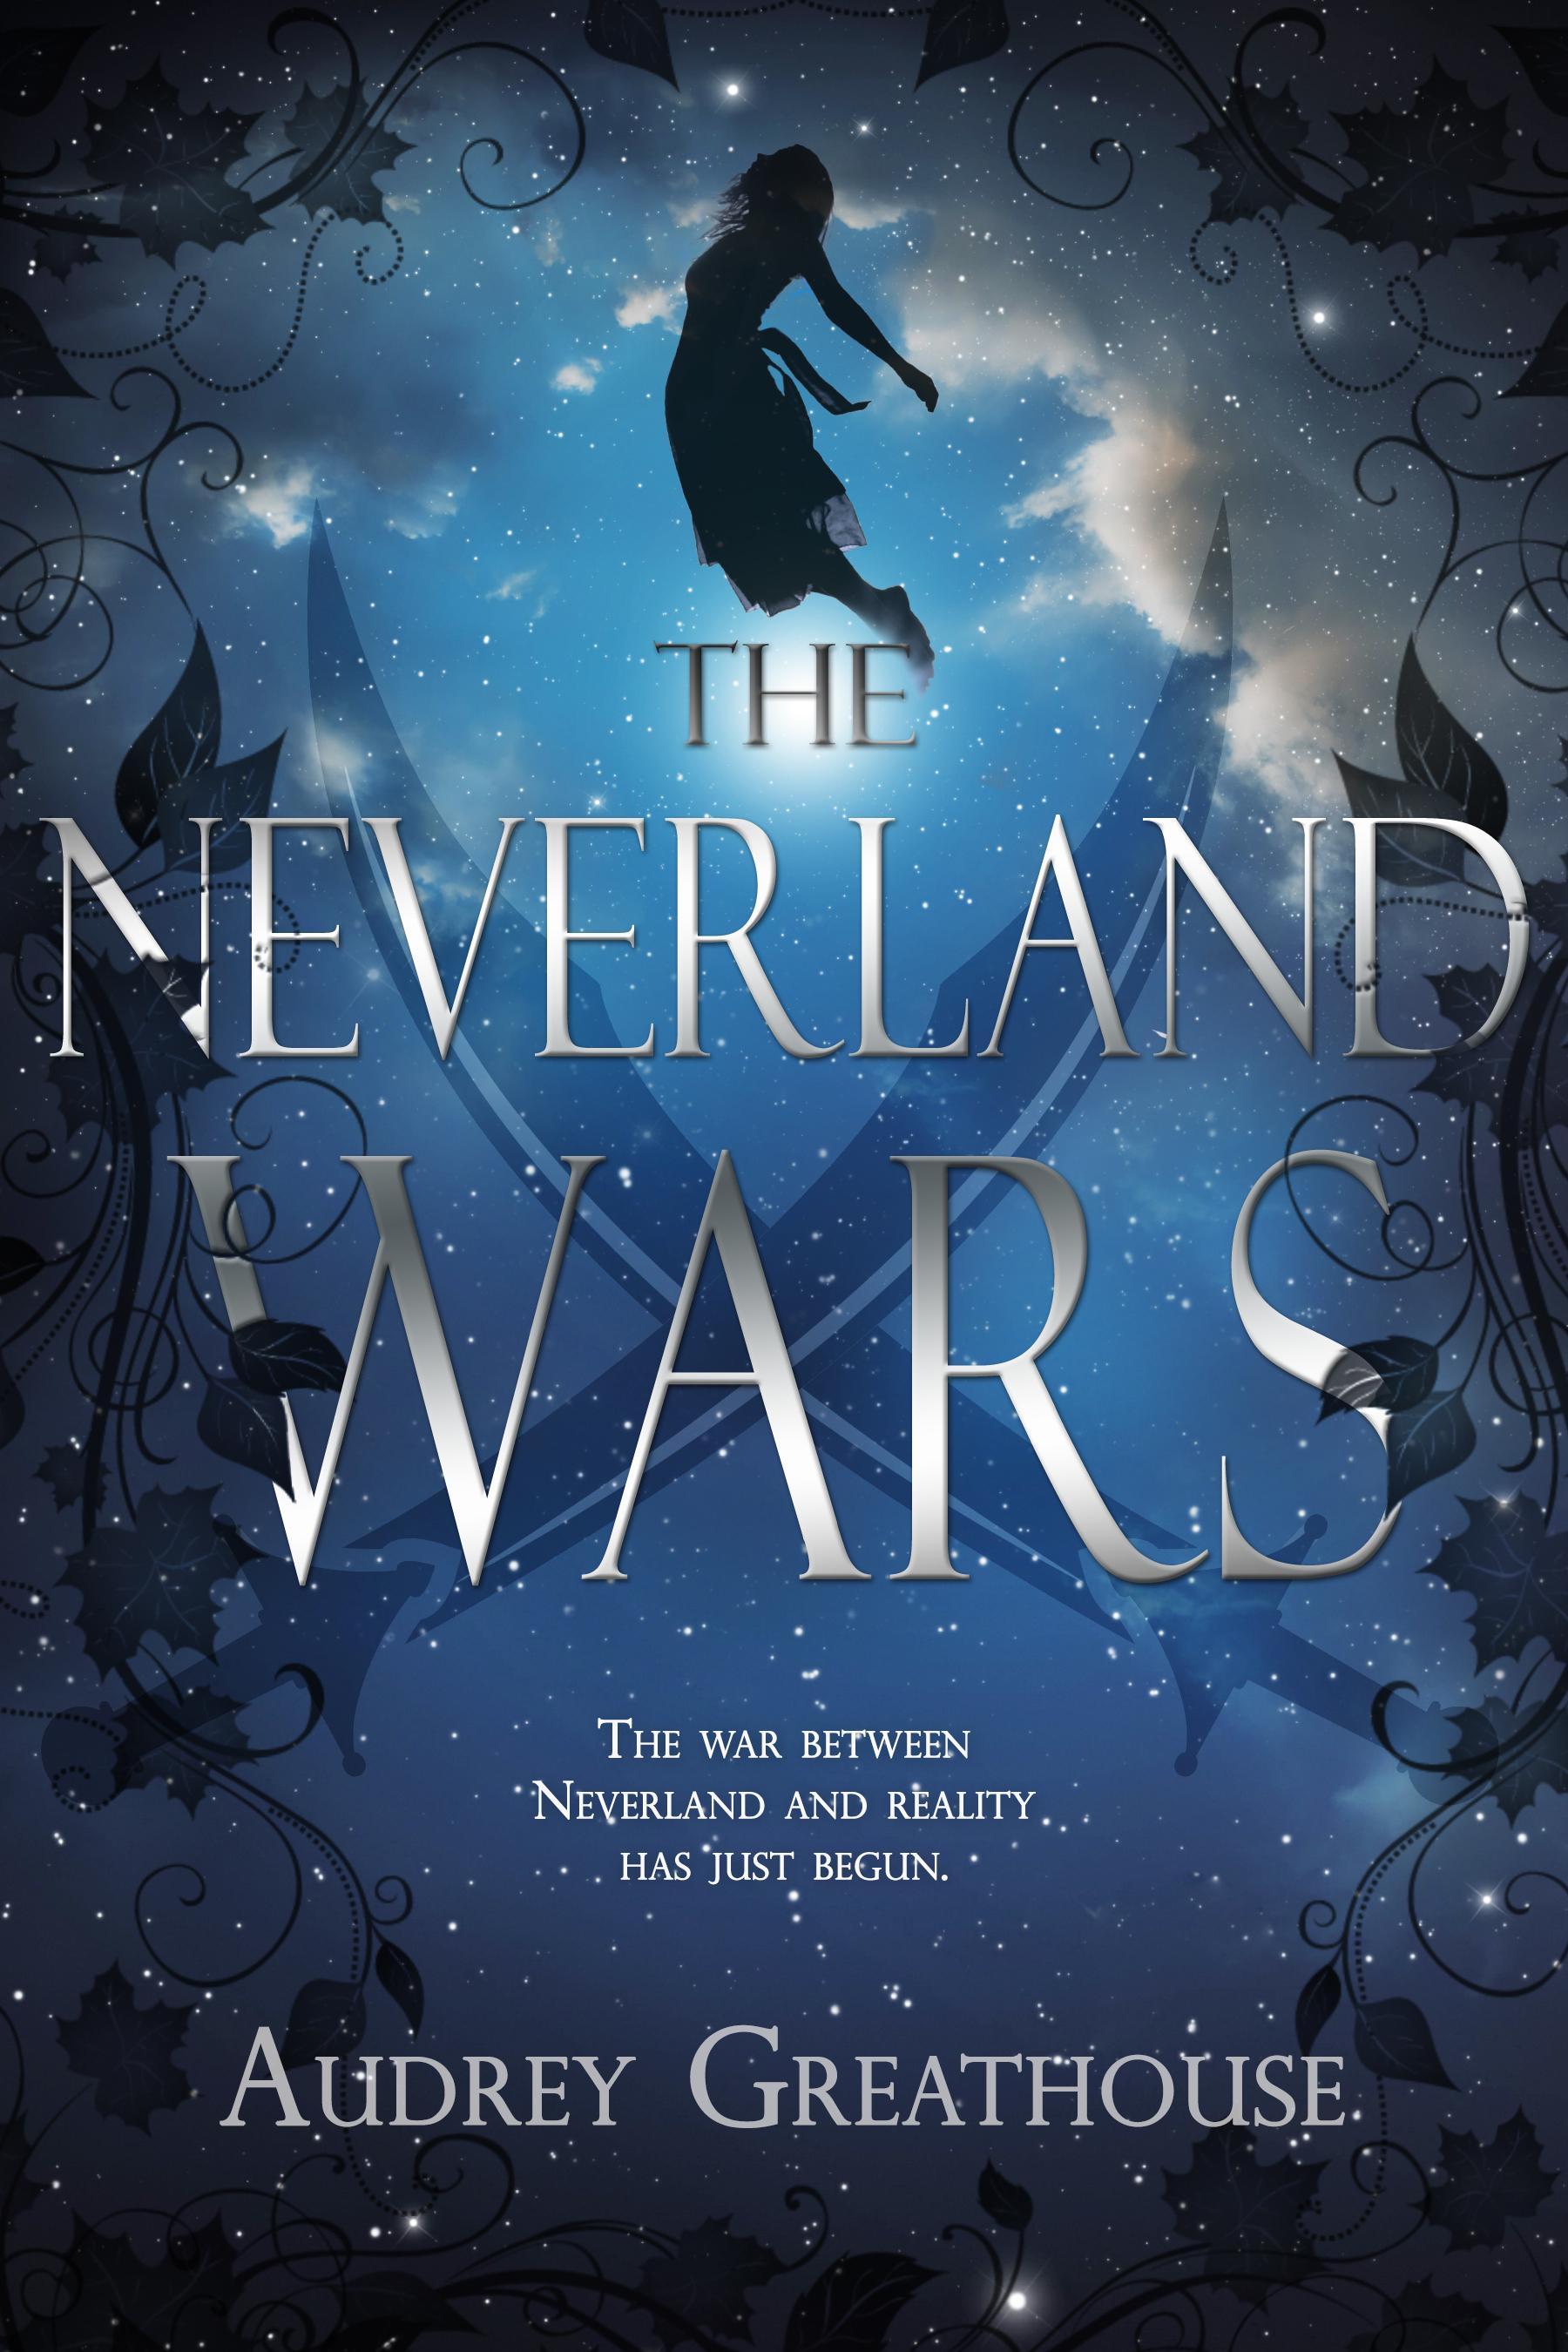 The Neverland Wars (The Neverland Wars, #1)